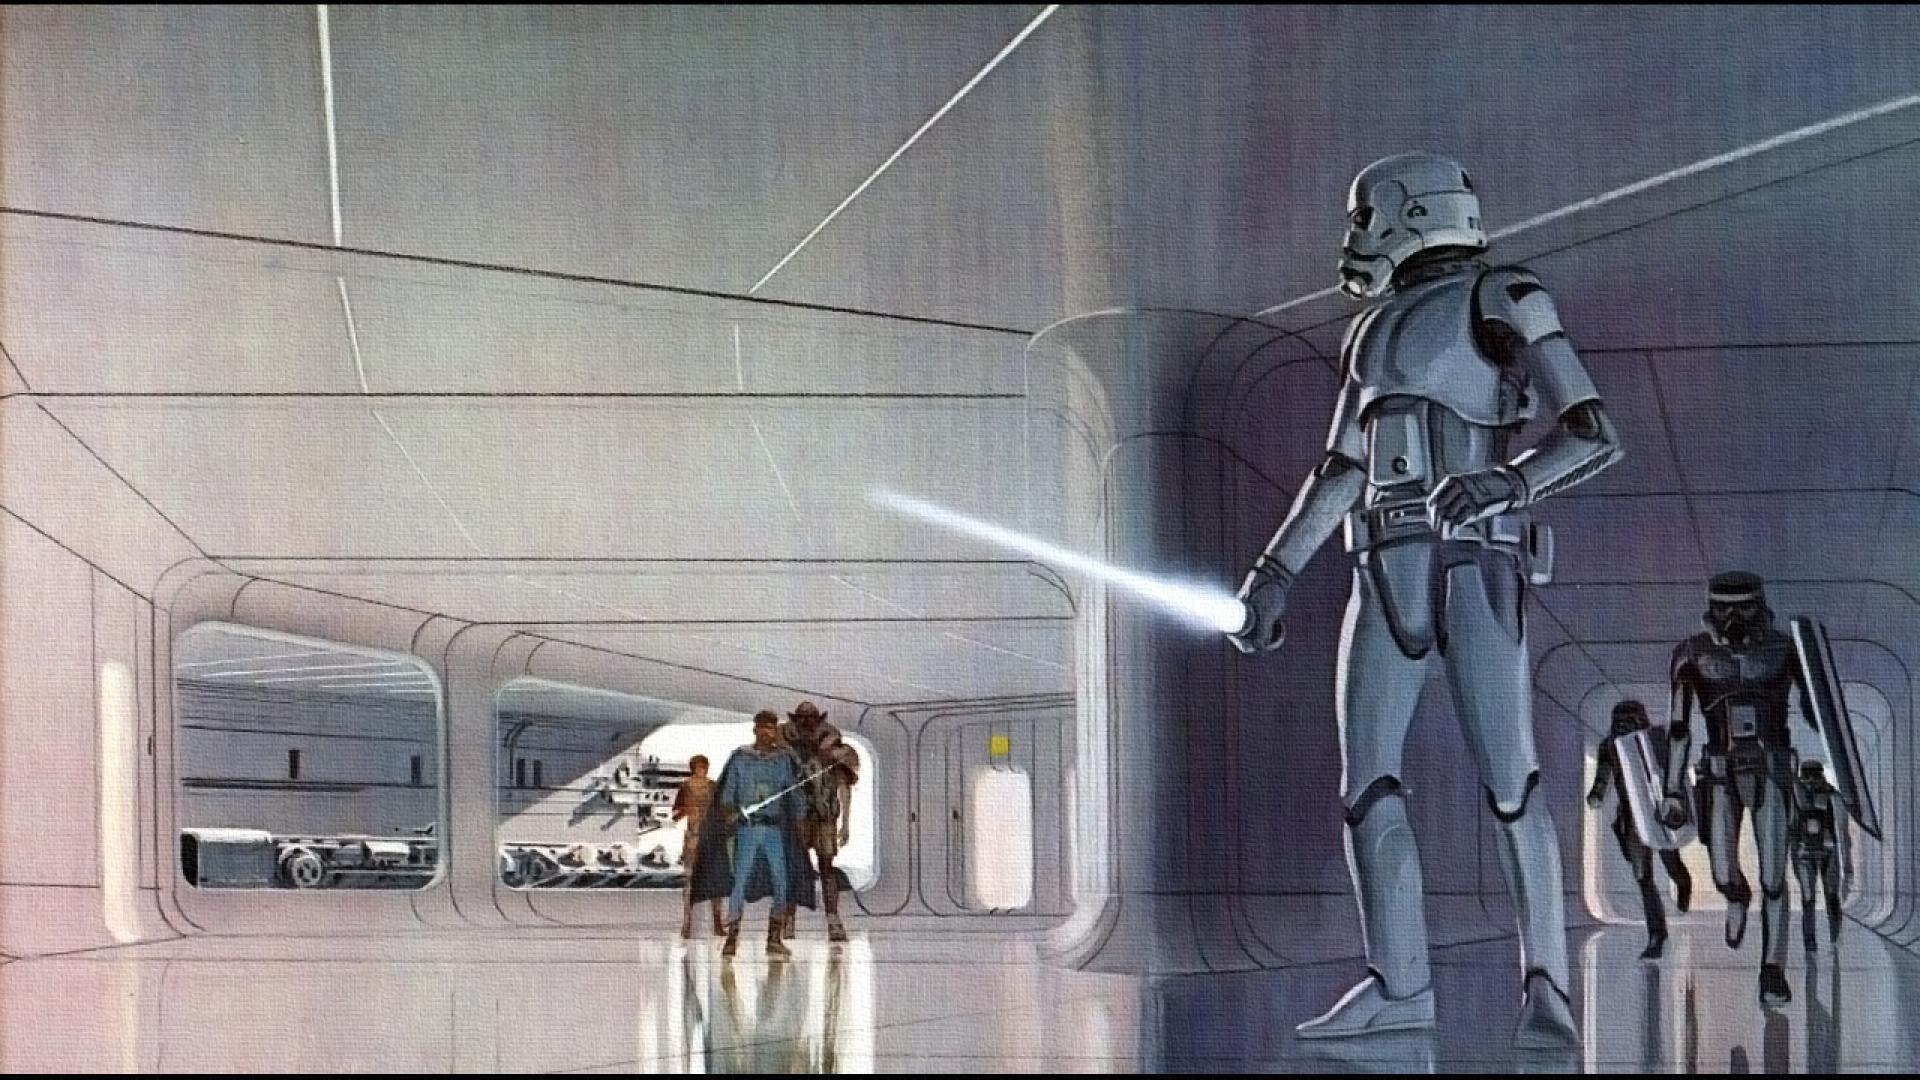 48 Star Wars Concept Art Wallpaper On Wallpapersafari